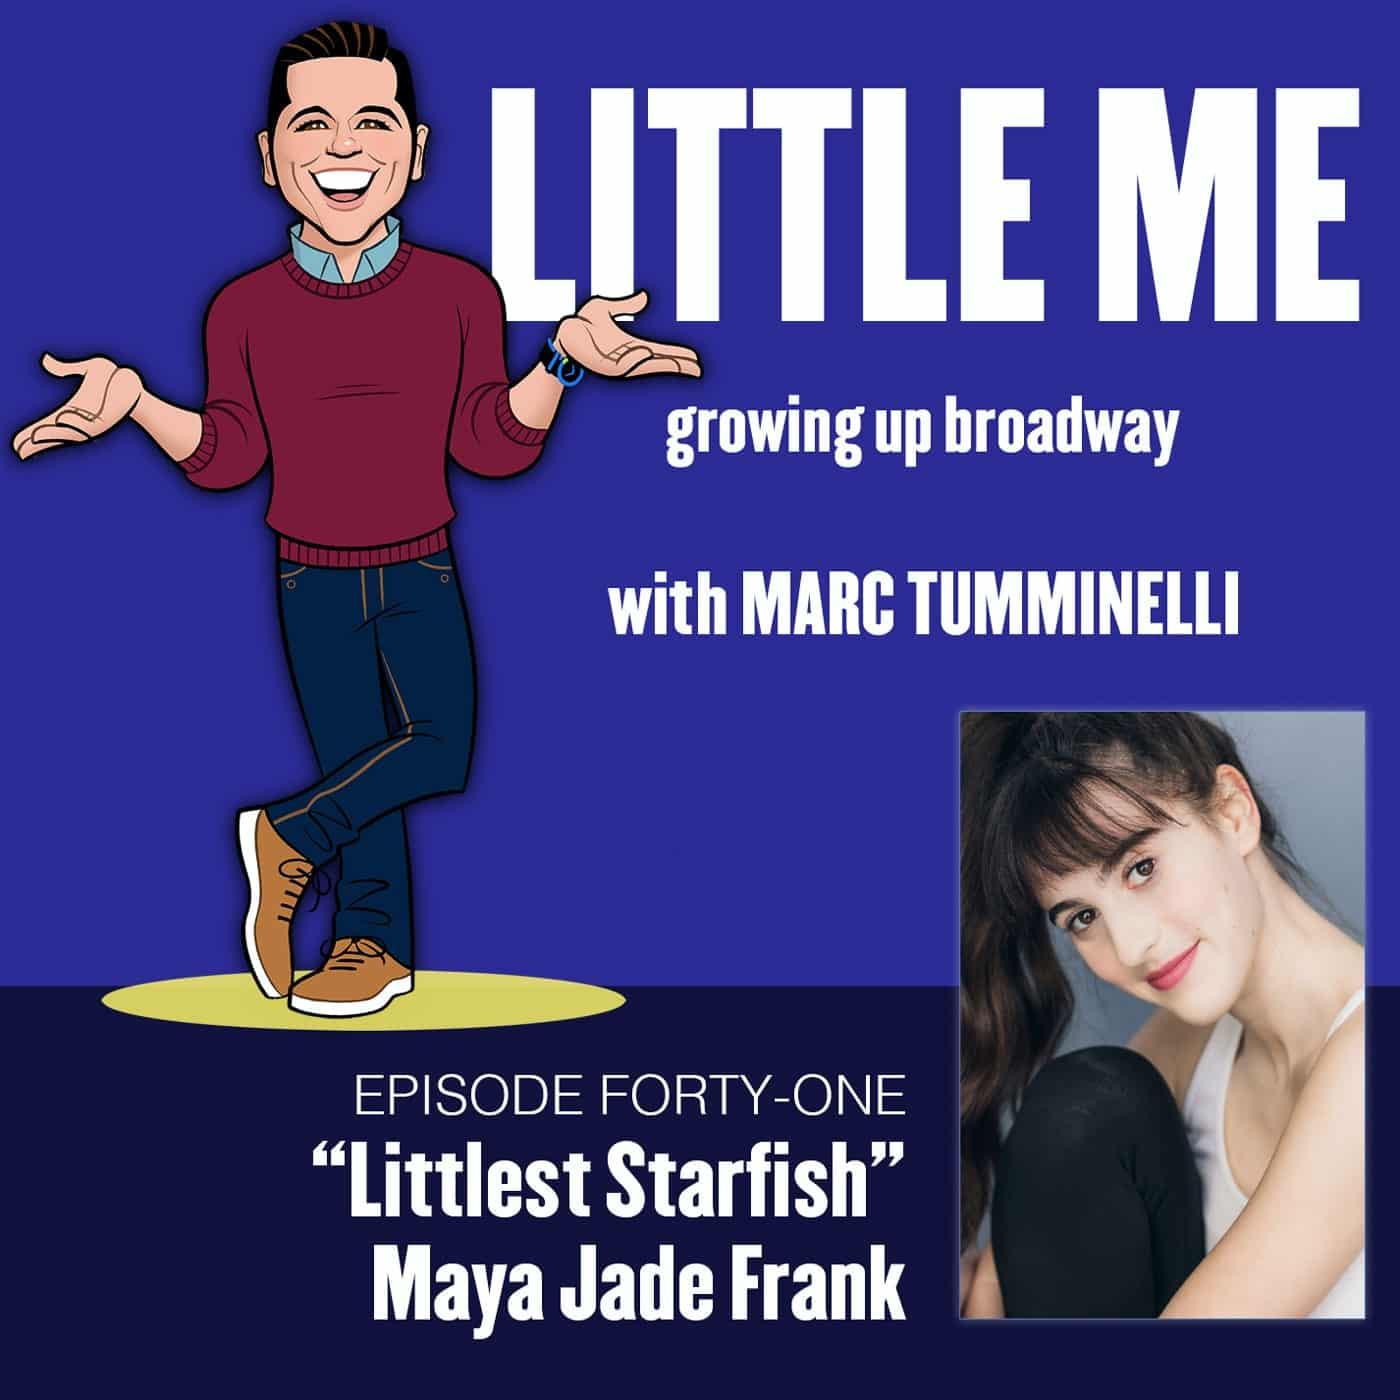 EP41 - Maya Jade Frank - Littlest Starfish